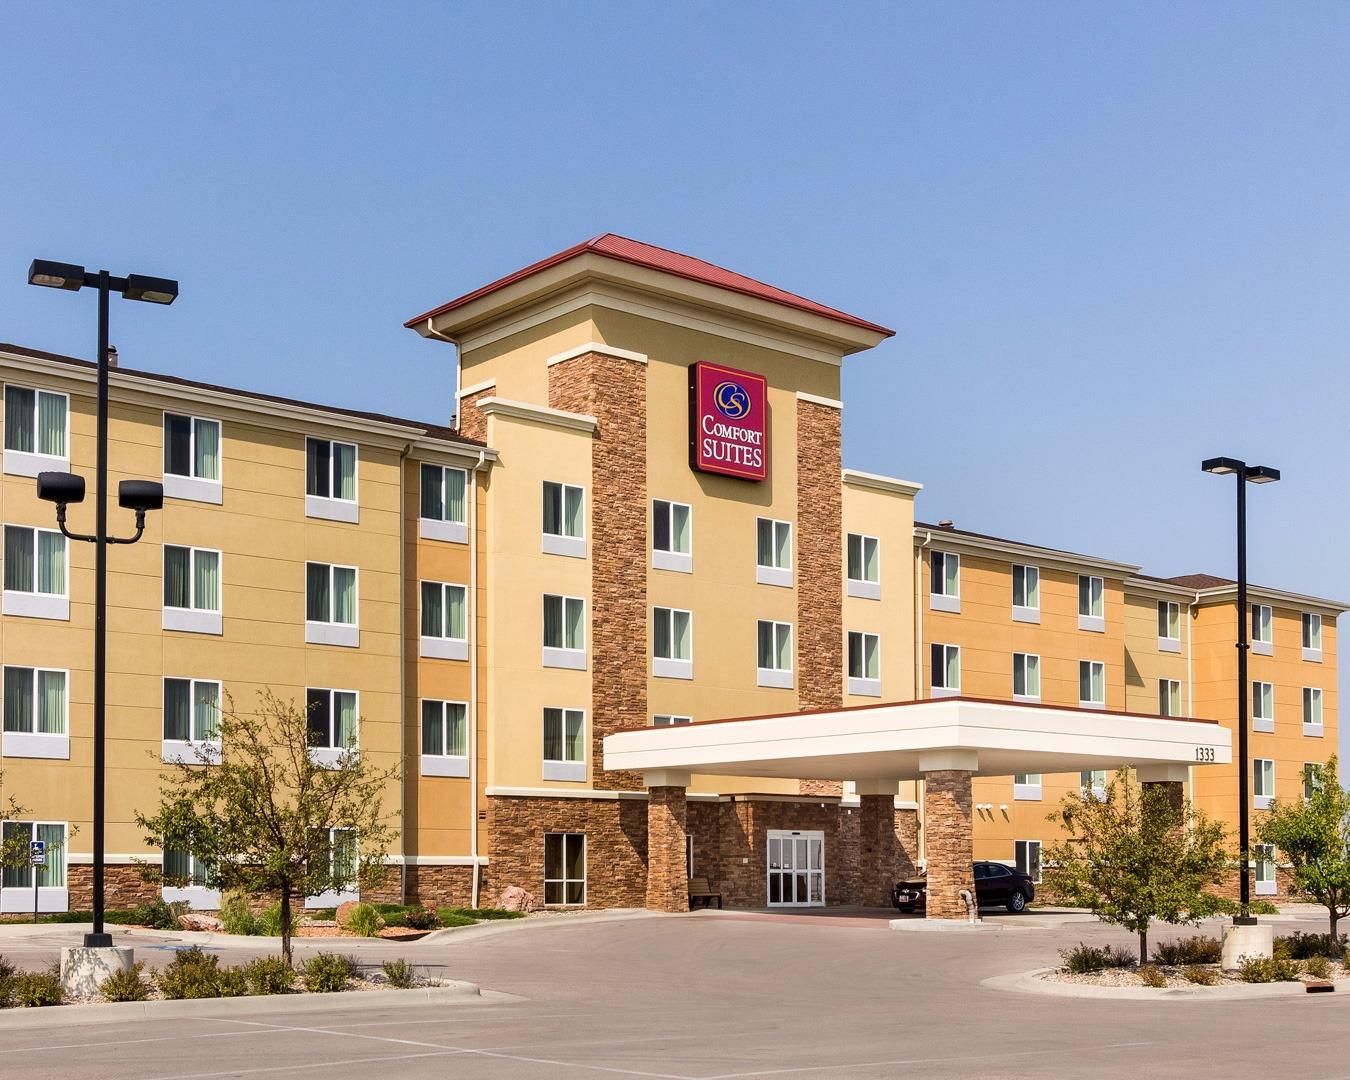 Comfort Suites, Rapid City SD